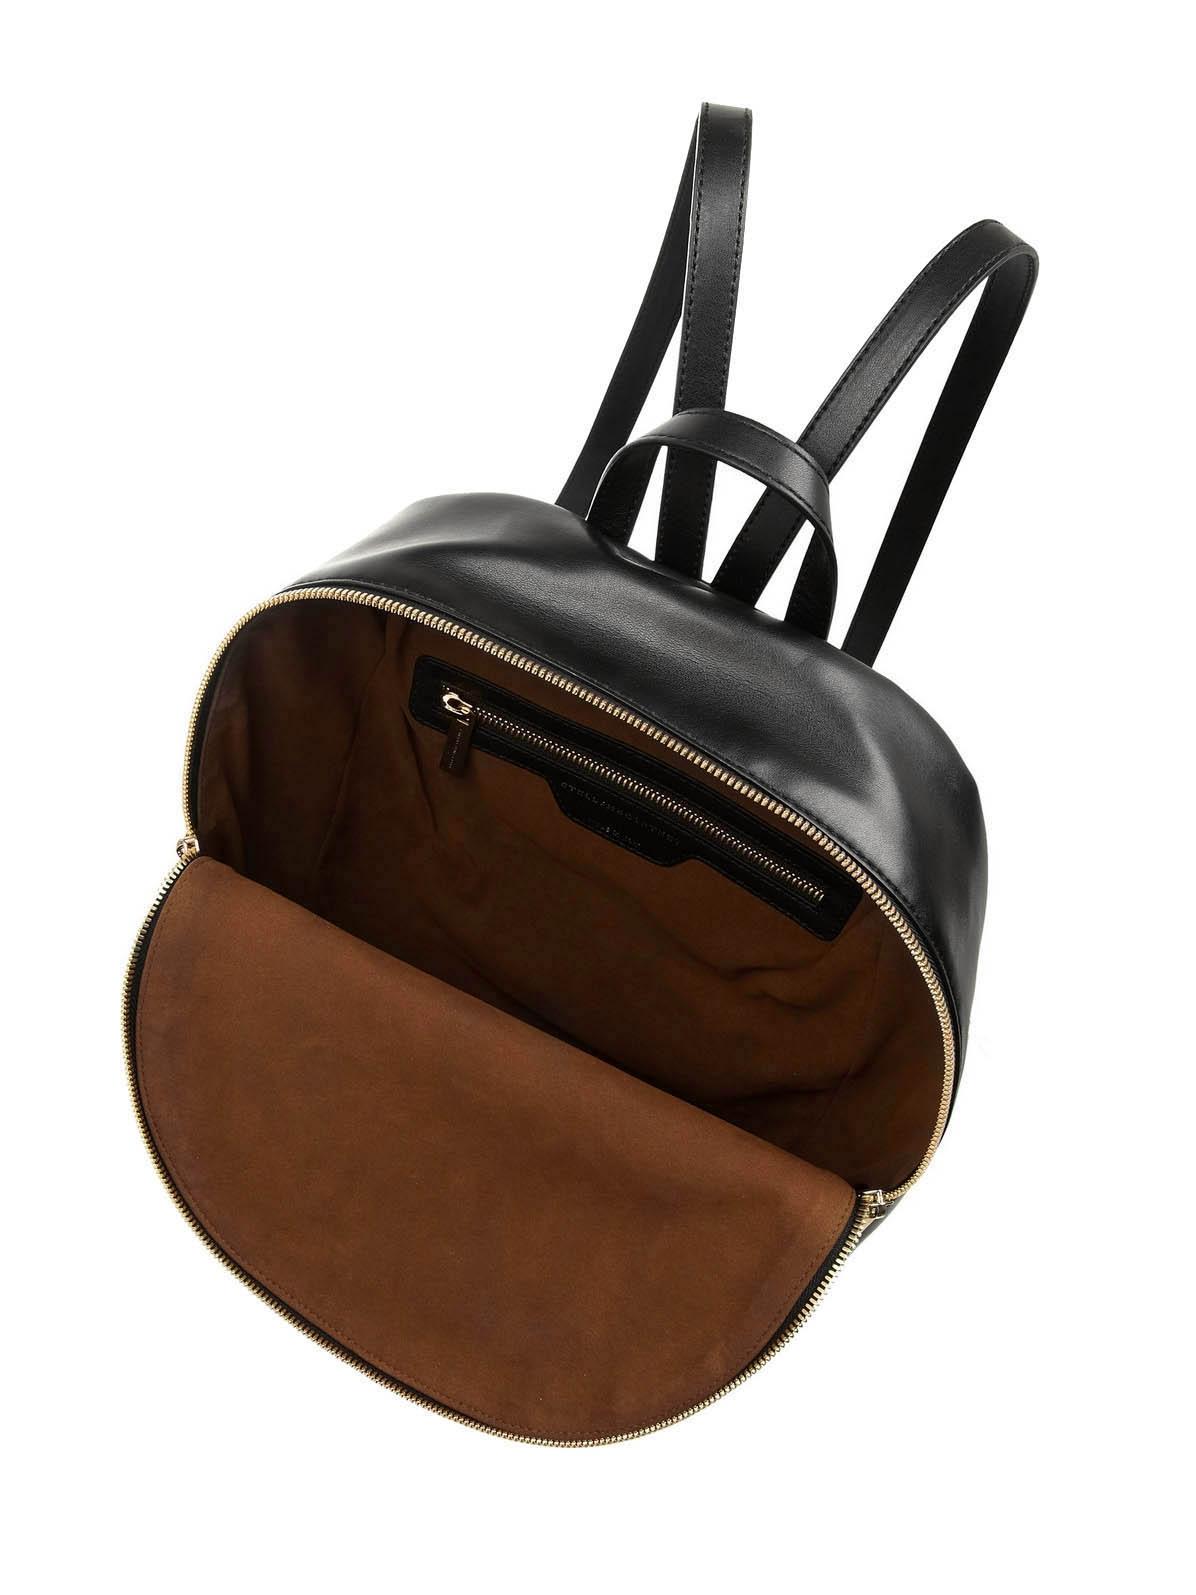 b0f99abf5f1 ... Sac à dos BECKETT noir en faux cuir eco-friendly Prix boutique 1050€ ...